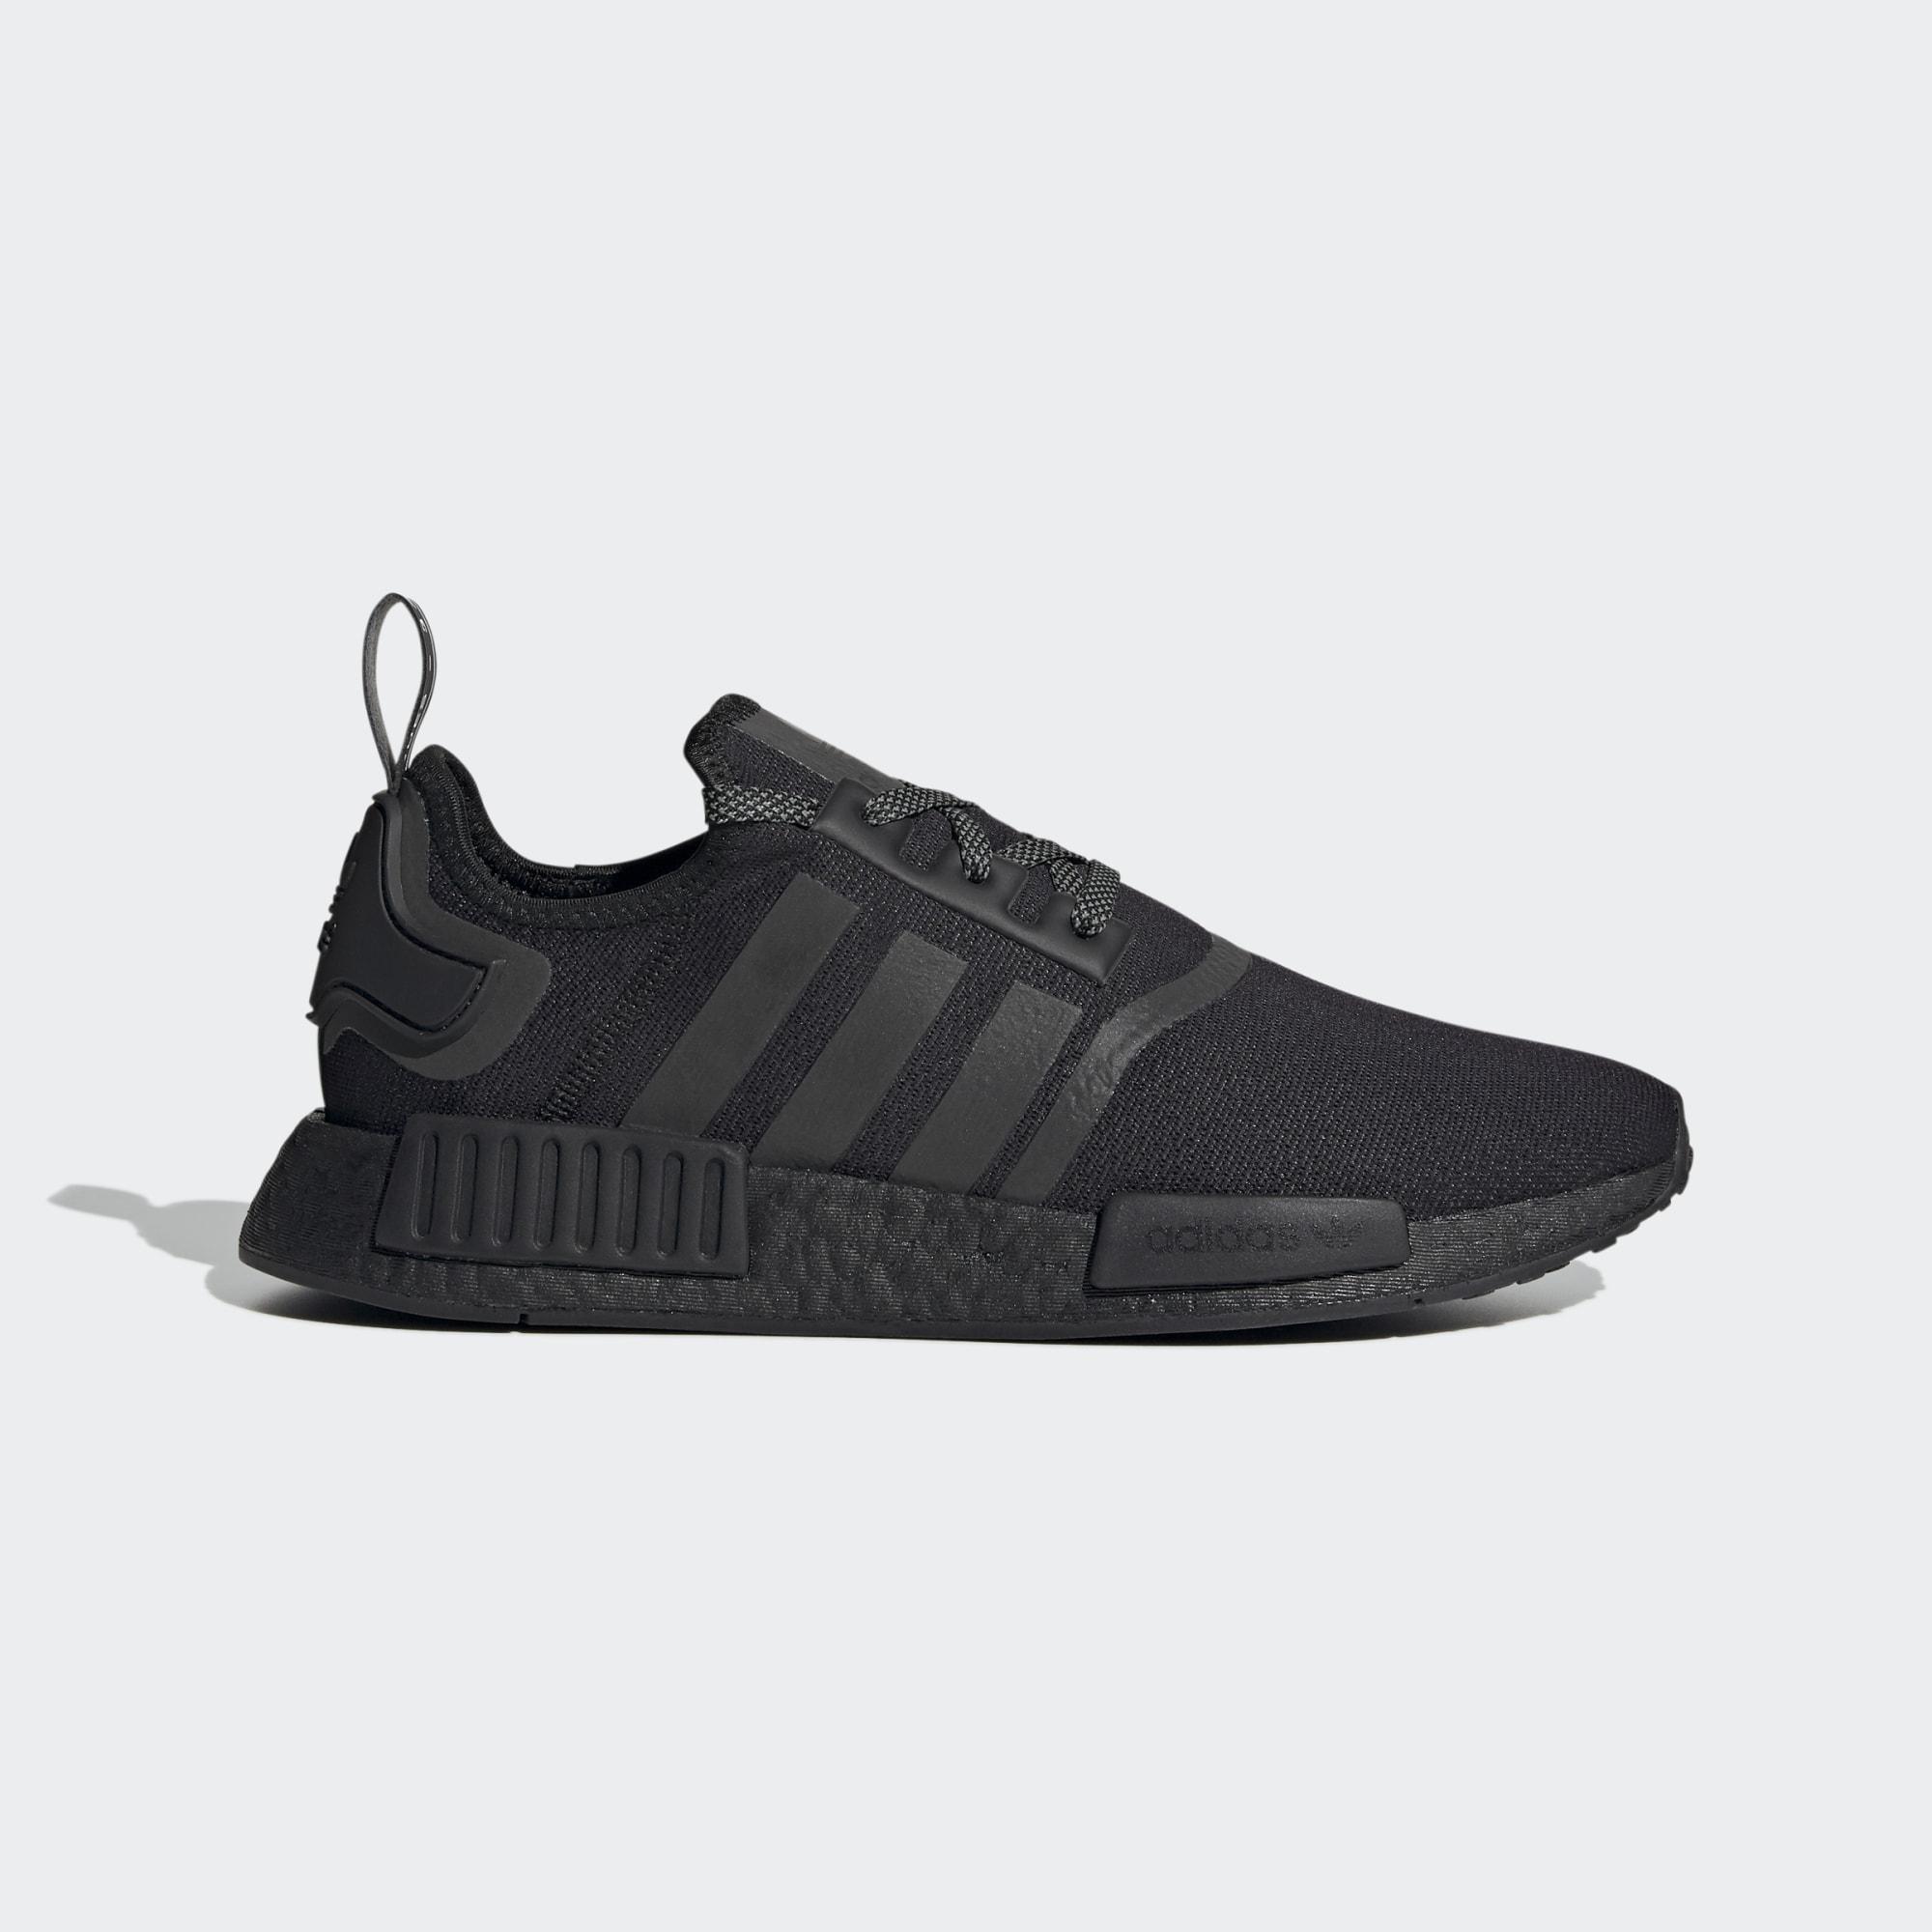 giay-sneaker-adidas-nmd-r1-black-reflective-fy2925-hang-chinh-hang-bounty-sneake